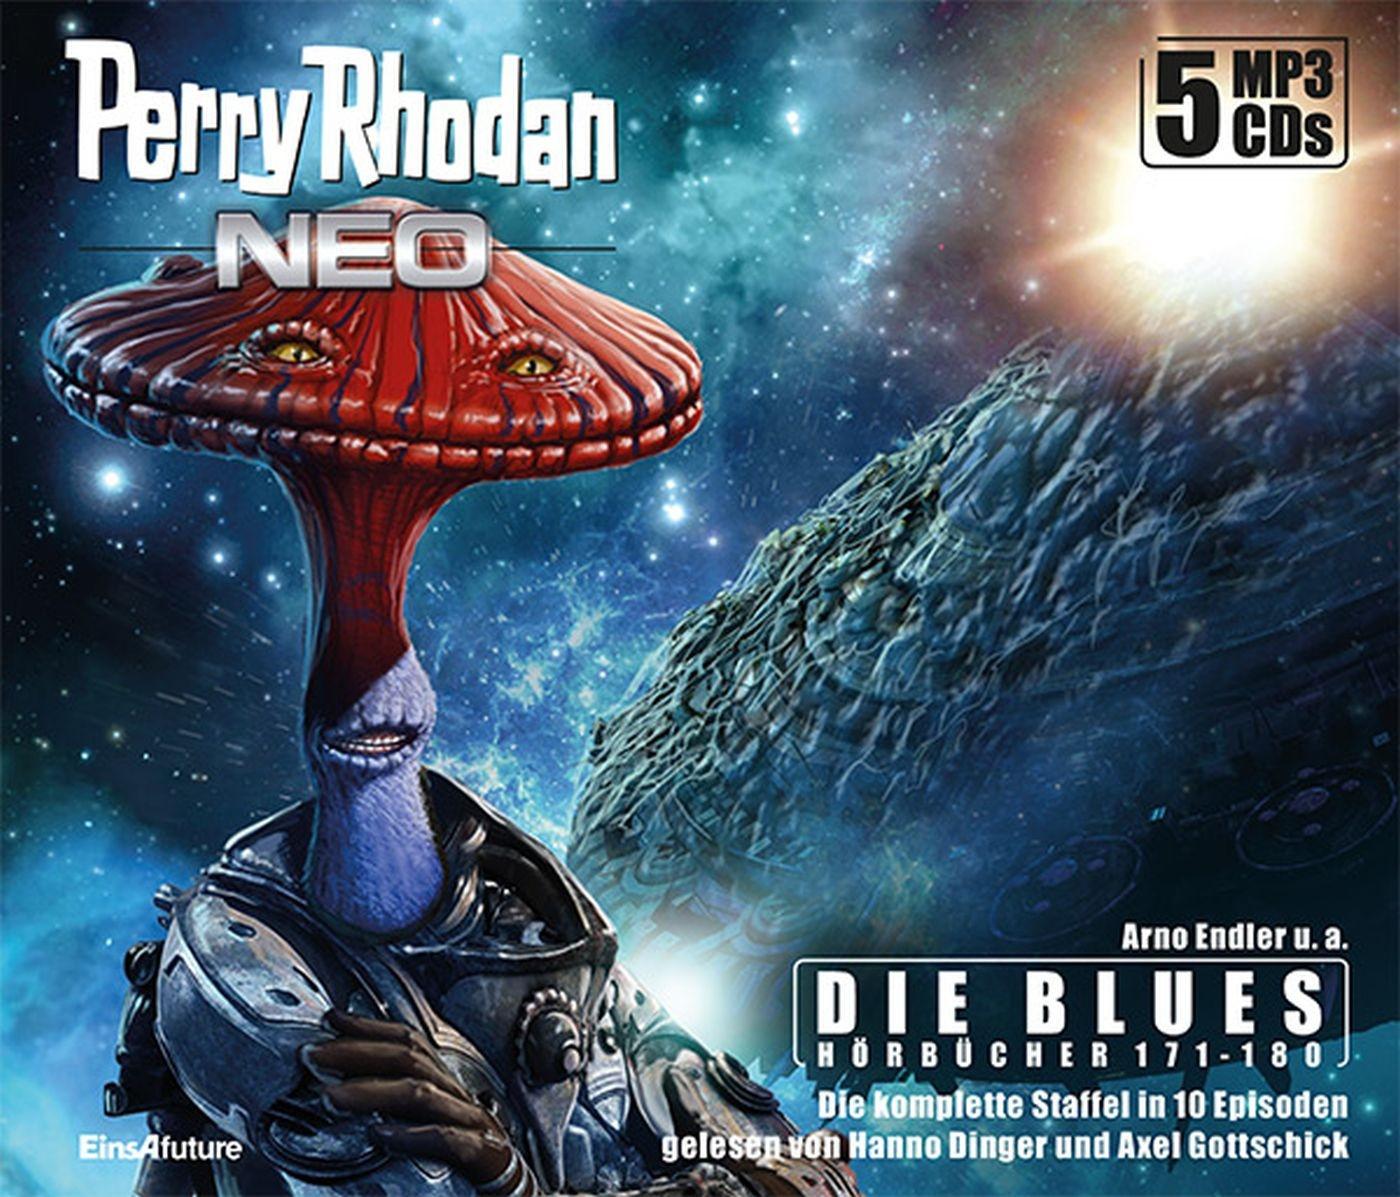 Perry Rhodan Neo MP3-CD Episoden 171-180 (5 CD-Box)